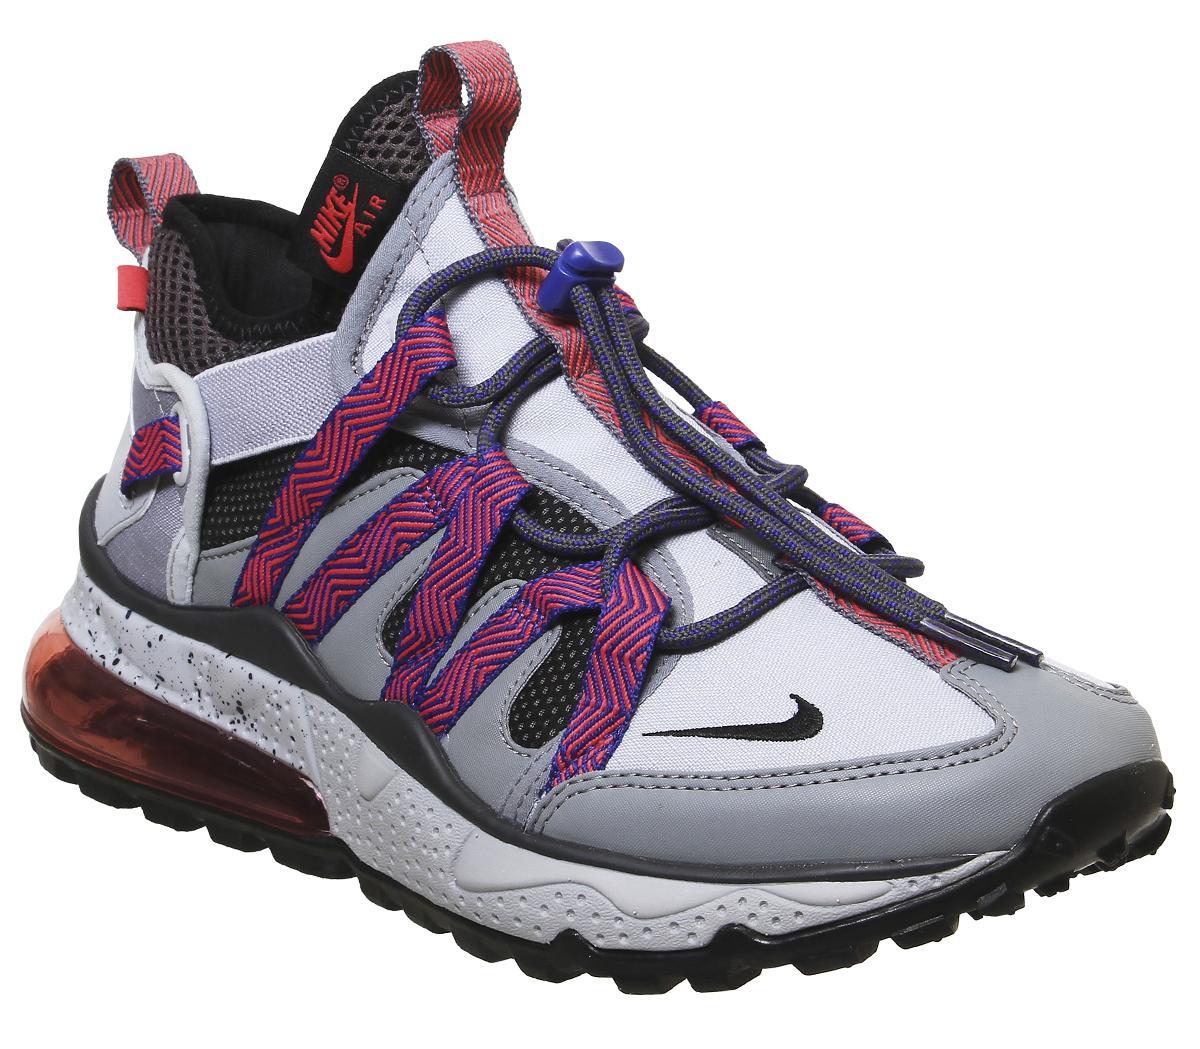 Nike Air Max 270 Bowfin Trainers Cool